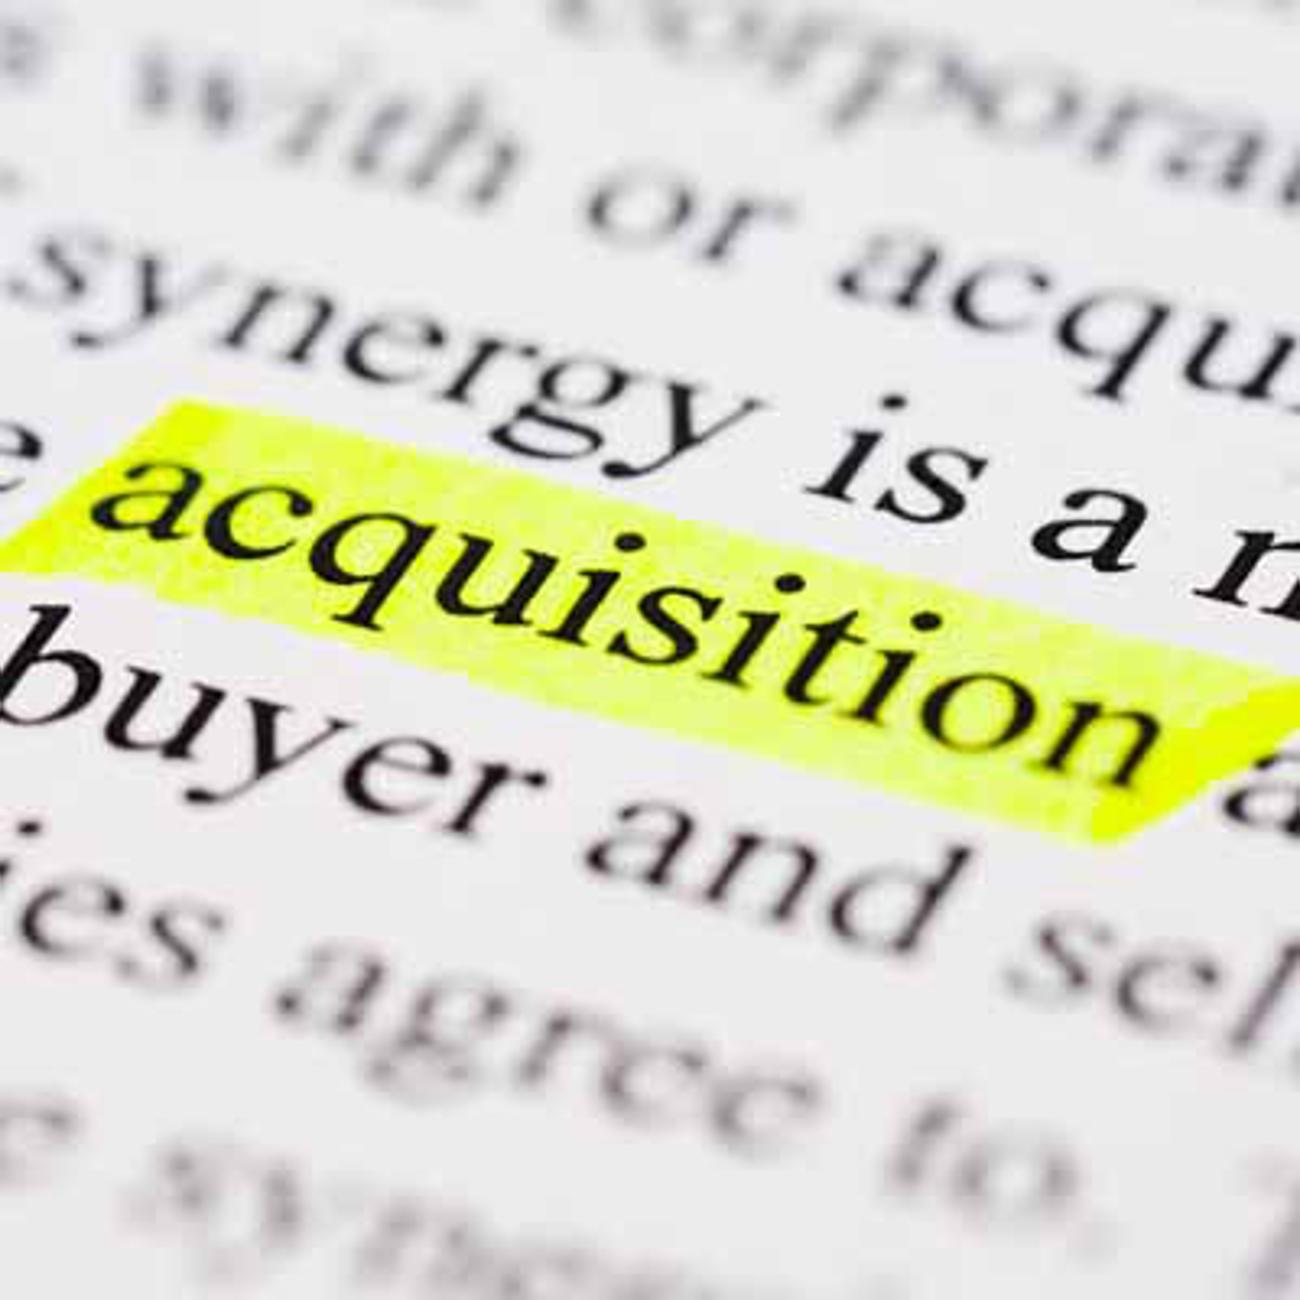 Broadcom In Talks To Buy Big Data Analytics Giant SAS Institute: Report